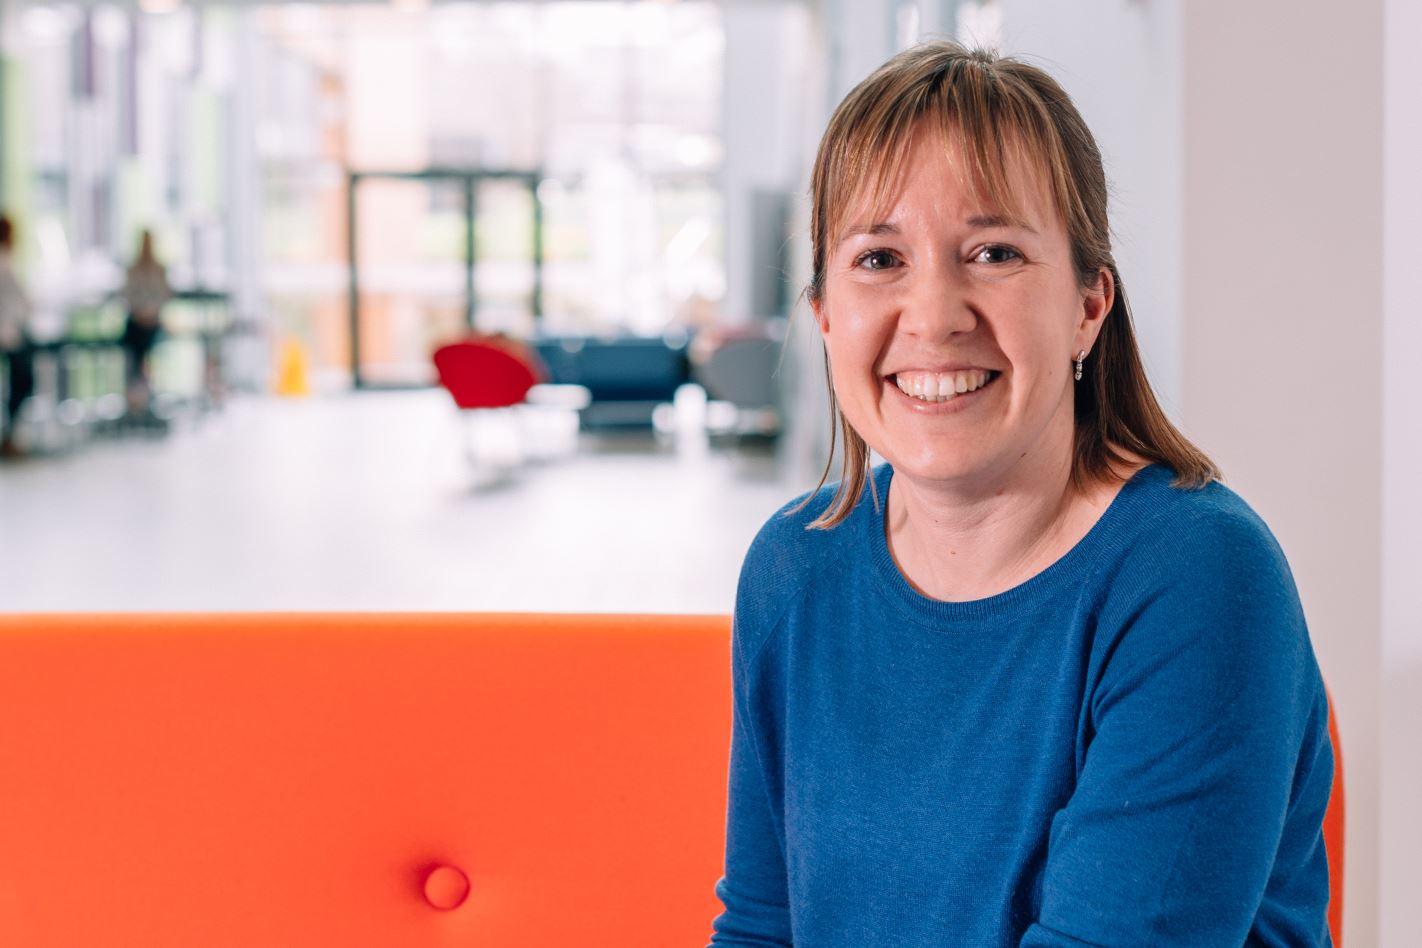 Dr Emma Haycraft, an academic psychologist from Loughborough University